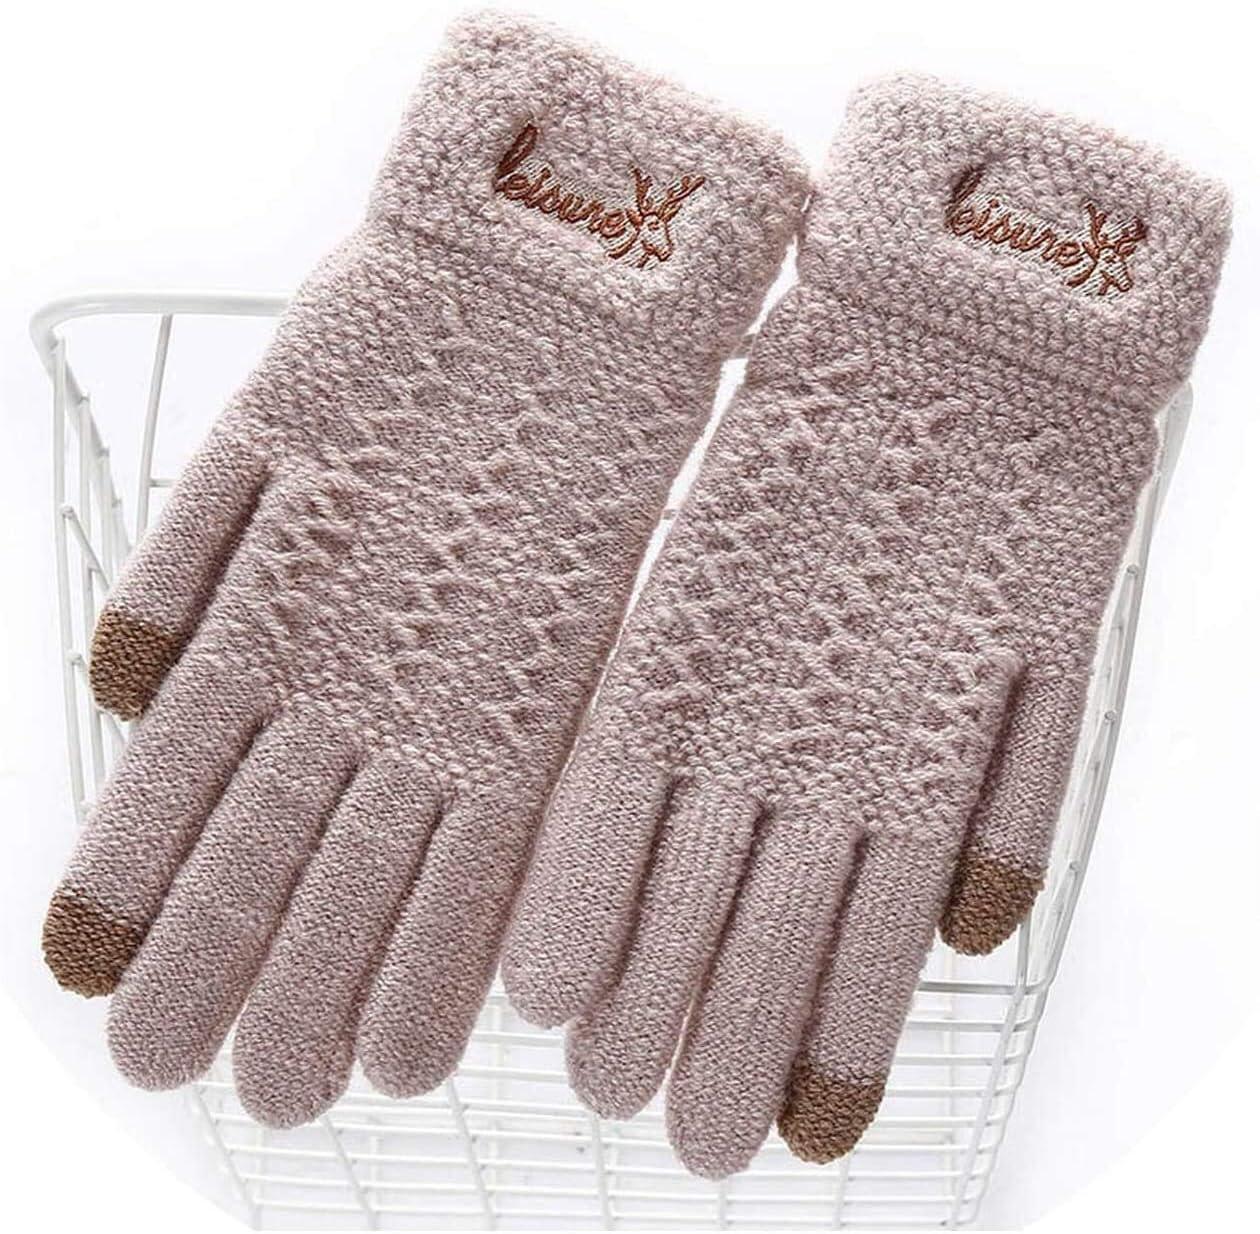 Samantha Warm Gloves Ladies Winter Warm Cute Cartoon Finger Knit Touch Screen Gloves Women Full Finger Soft Mittens Black Gloves (Color : E Soft White, Size : Oneszie)